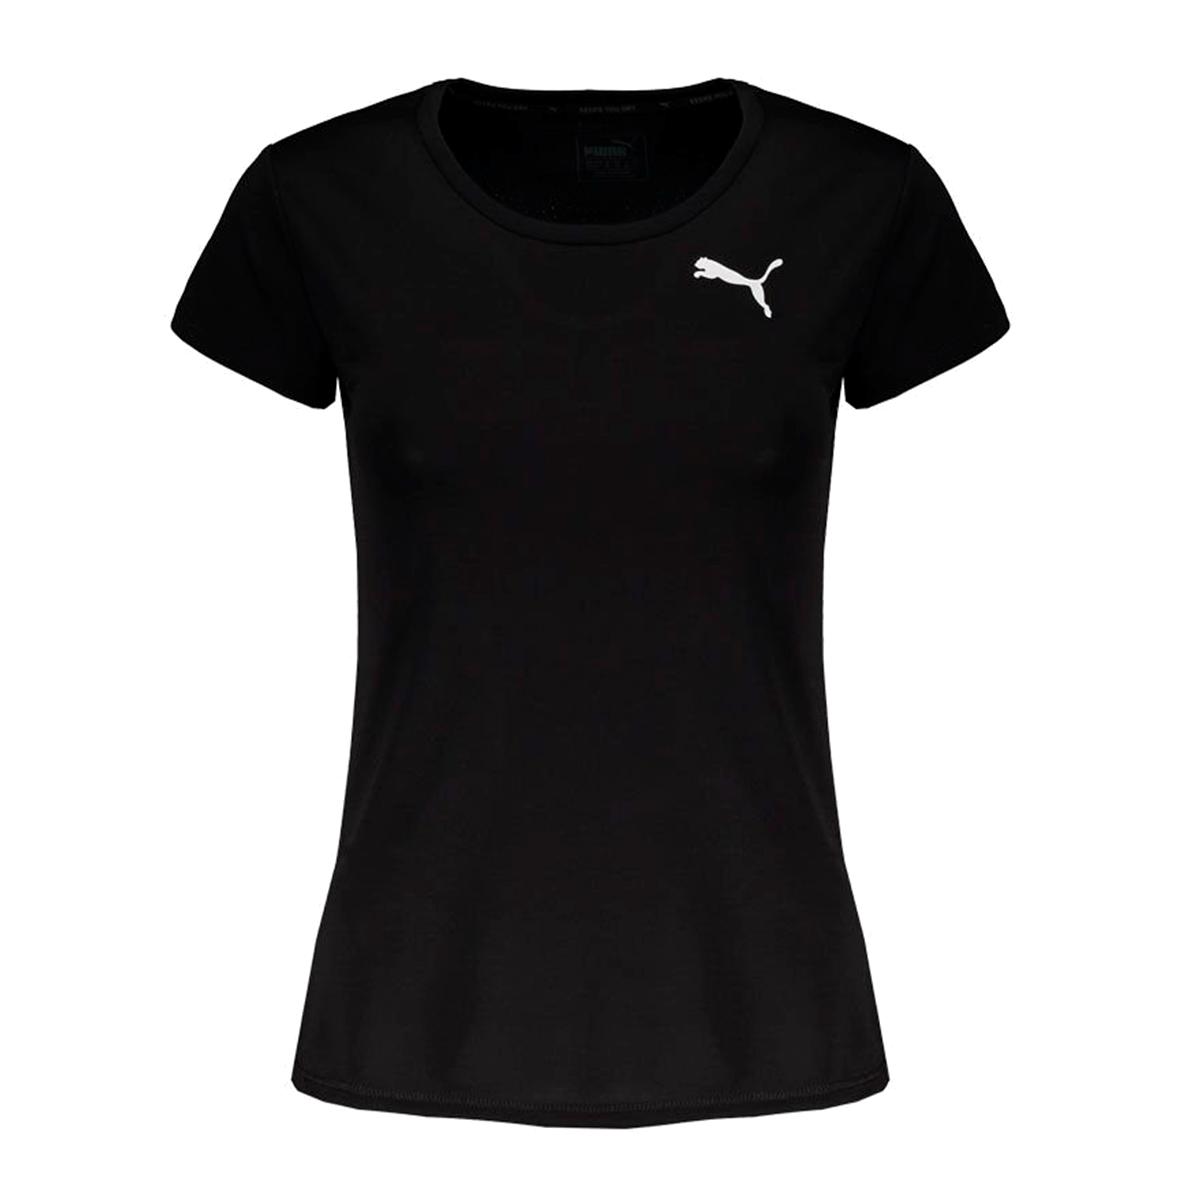 Camiseta Puma Active Tee Feminina Preto